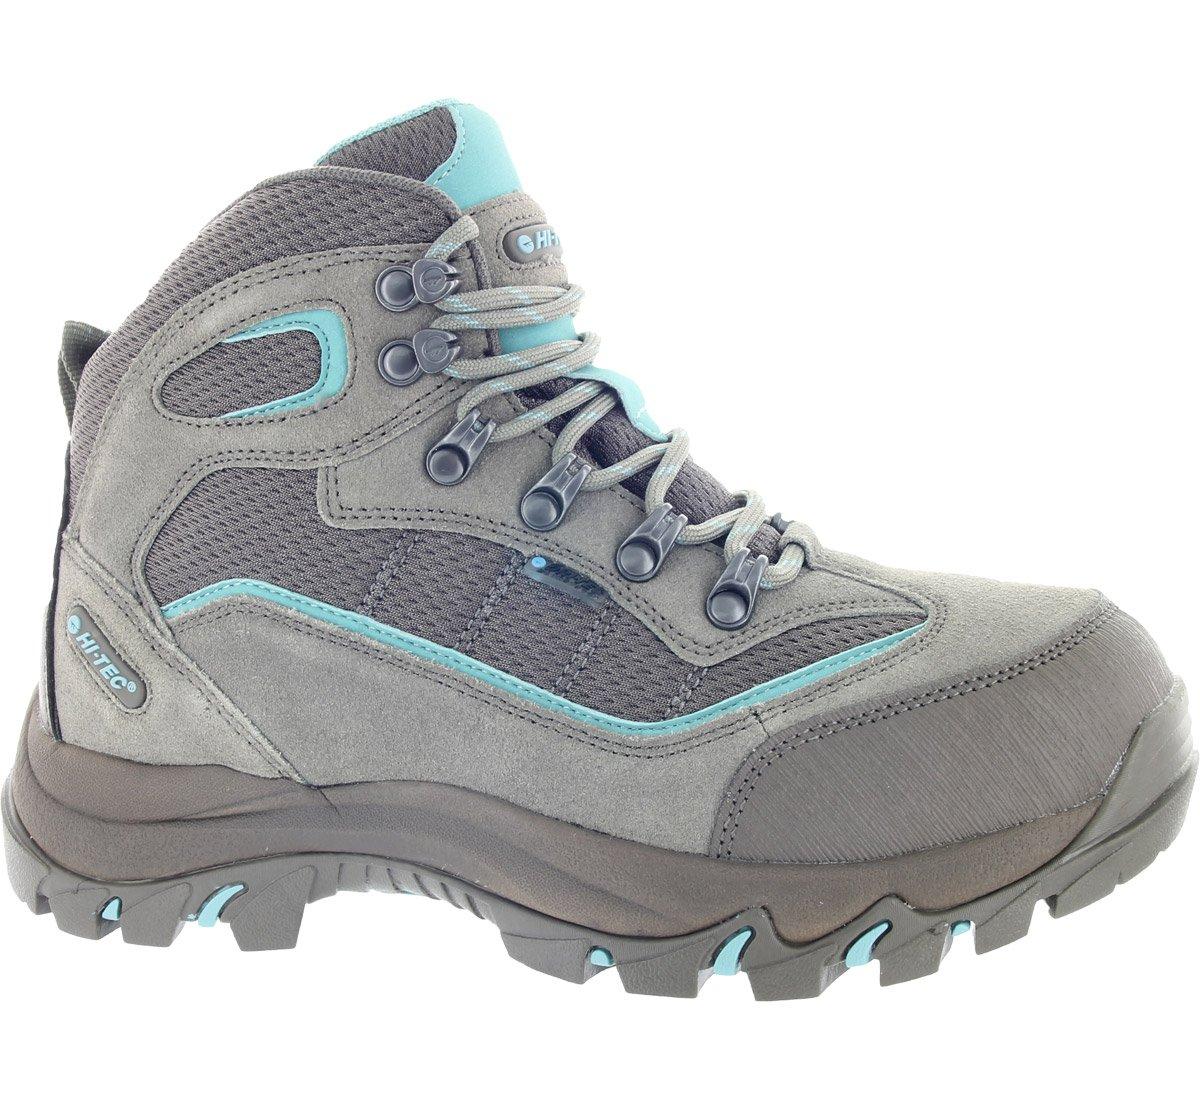 Hi-Tec Women's Skamania Hiking Boots Waterproof, Taupe/Smokey Brown/Mint, 5.5 B(M) US